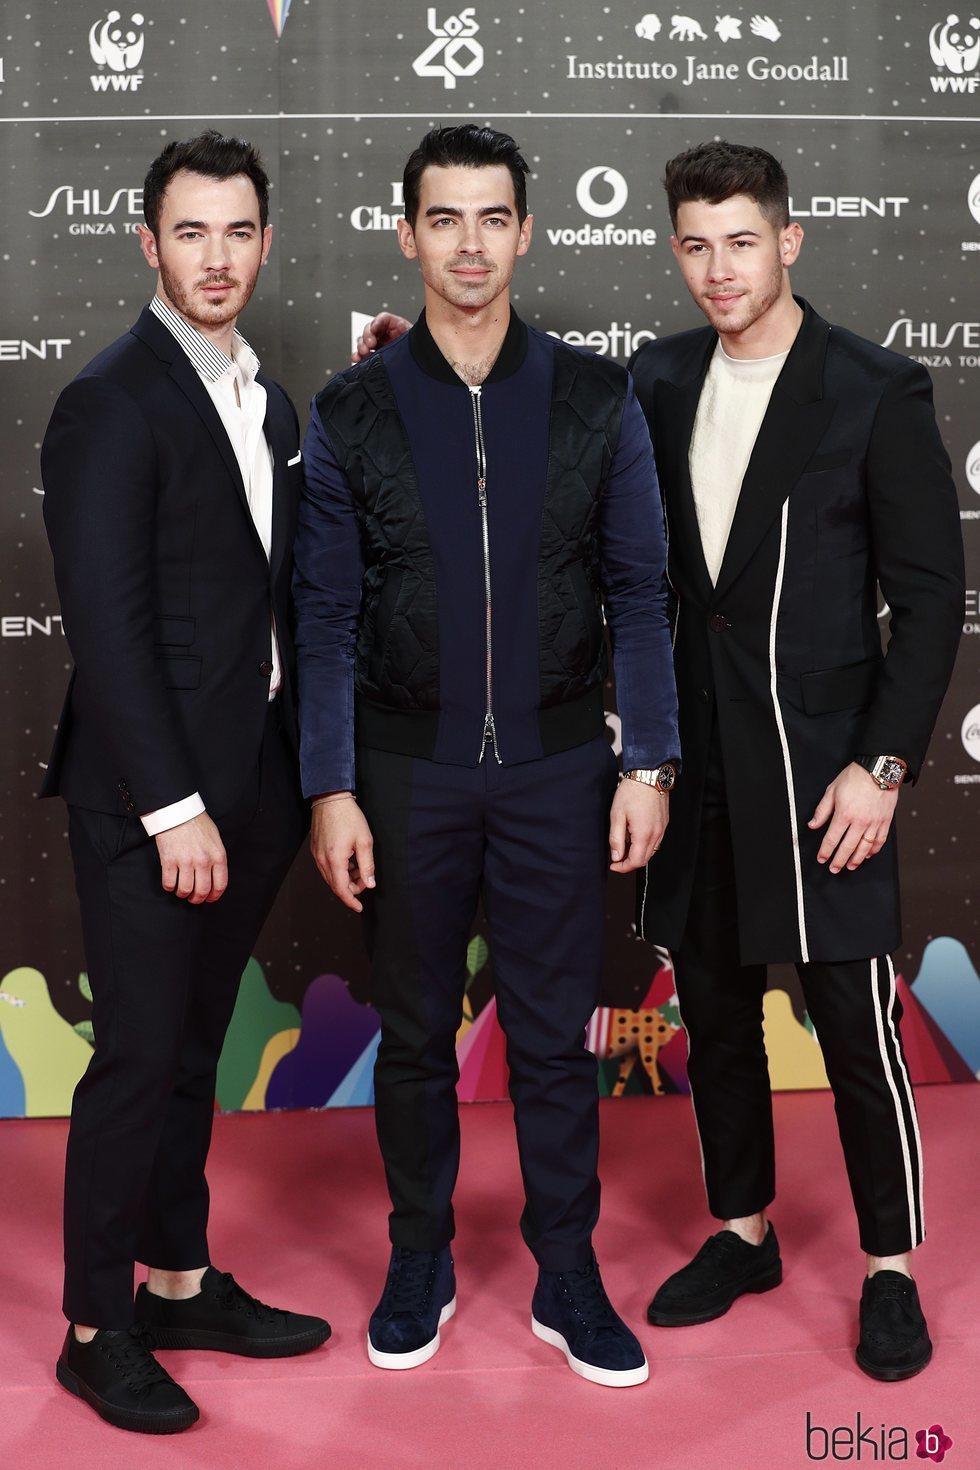 Nick Jonas, Joe Jonas y Kevin Jonas en Los 40 Music Awards 2019